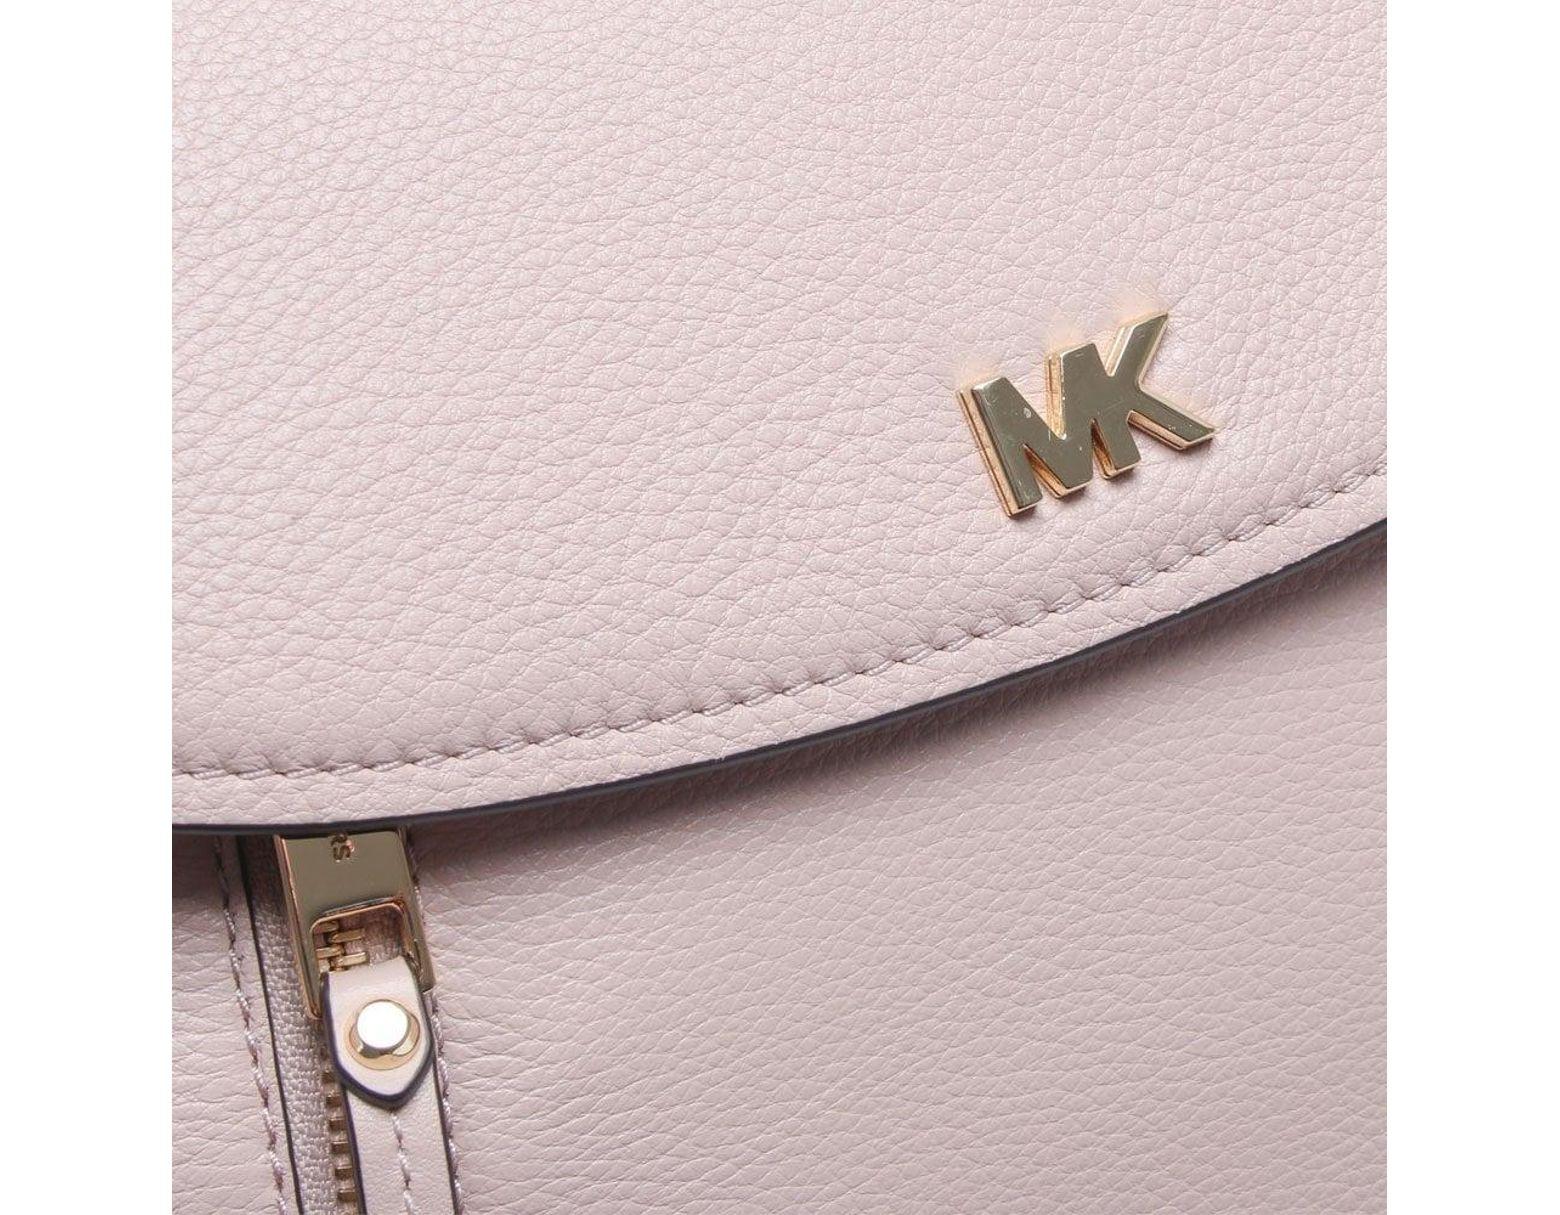 94a928f253d764 Michael Kors Medium Evie Soft Pink Leather Shoulder Bag in Pink - Lyst